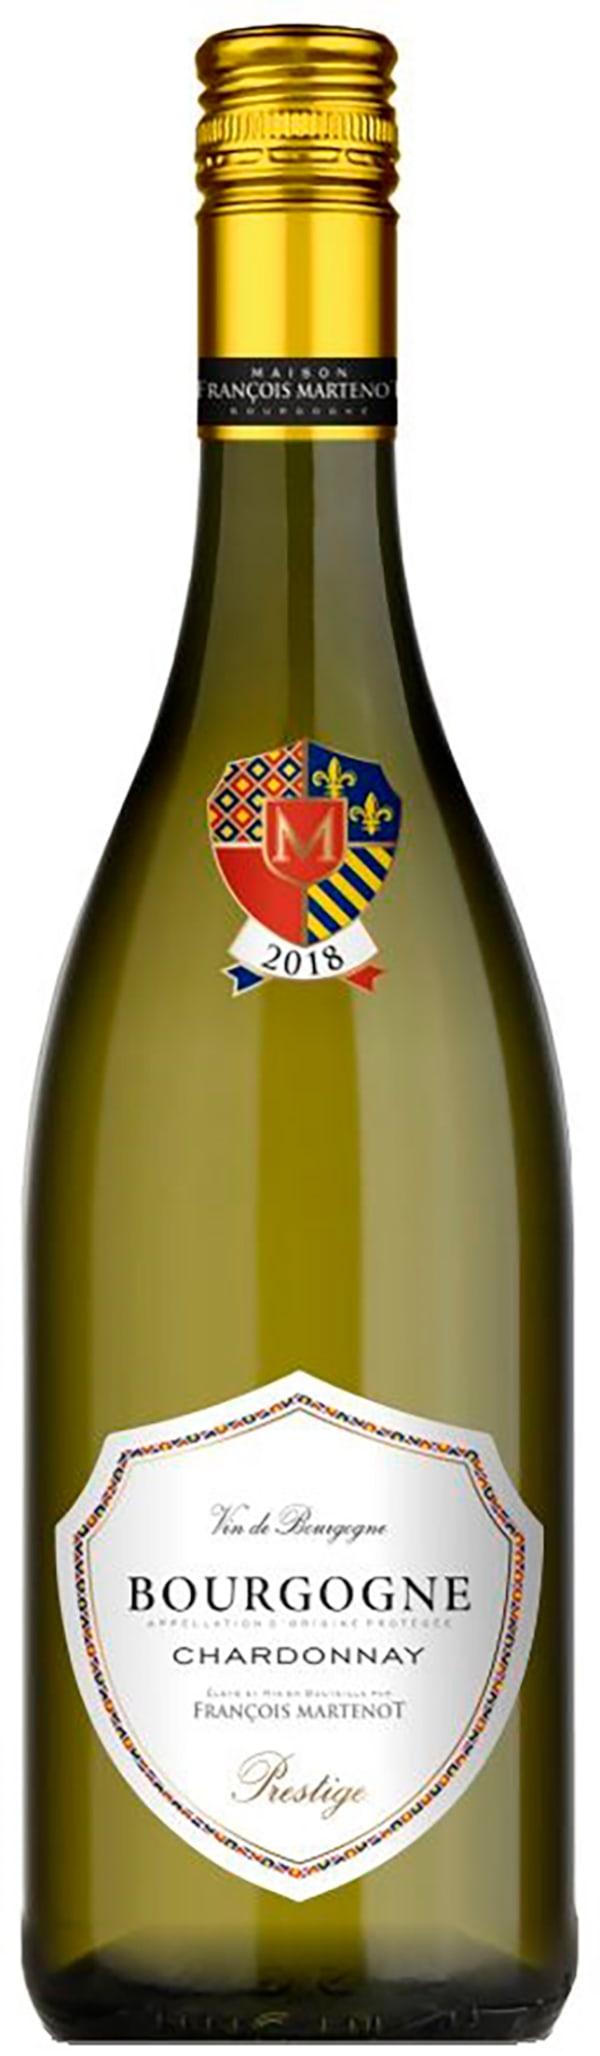 Bourgogne Chardonnay Prestige 2018